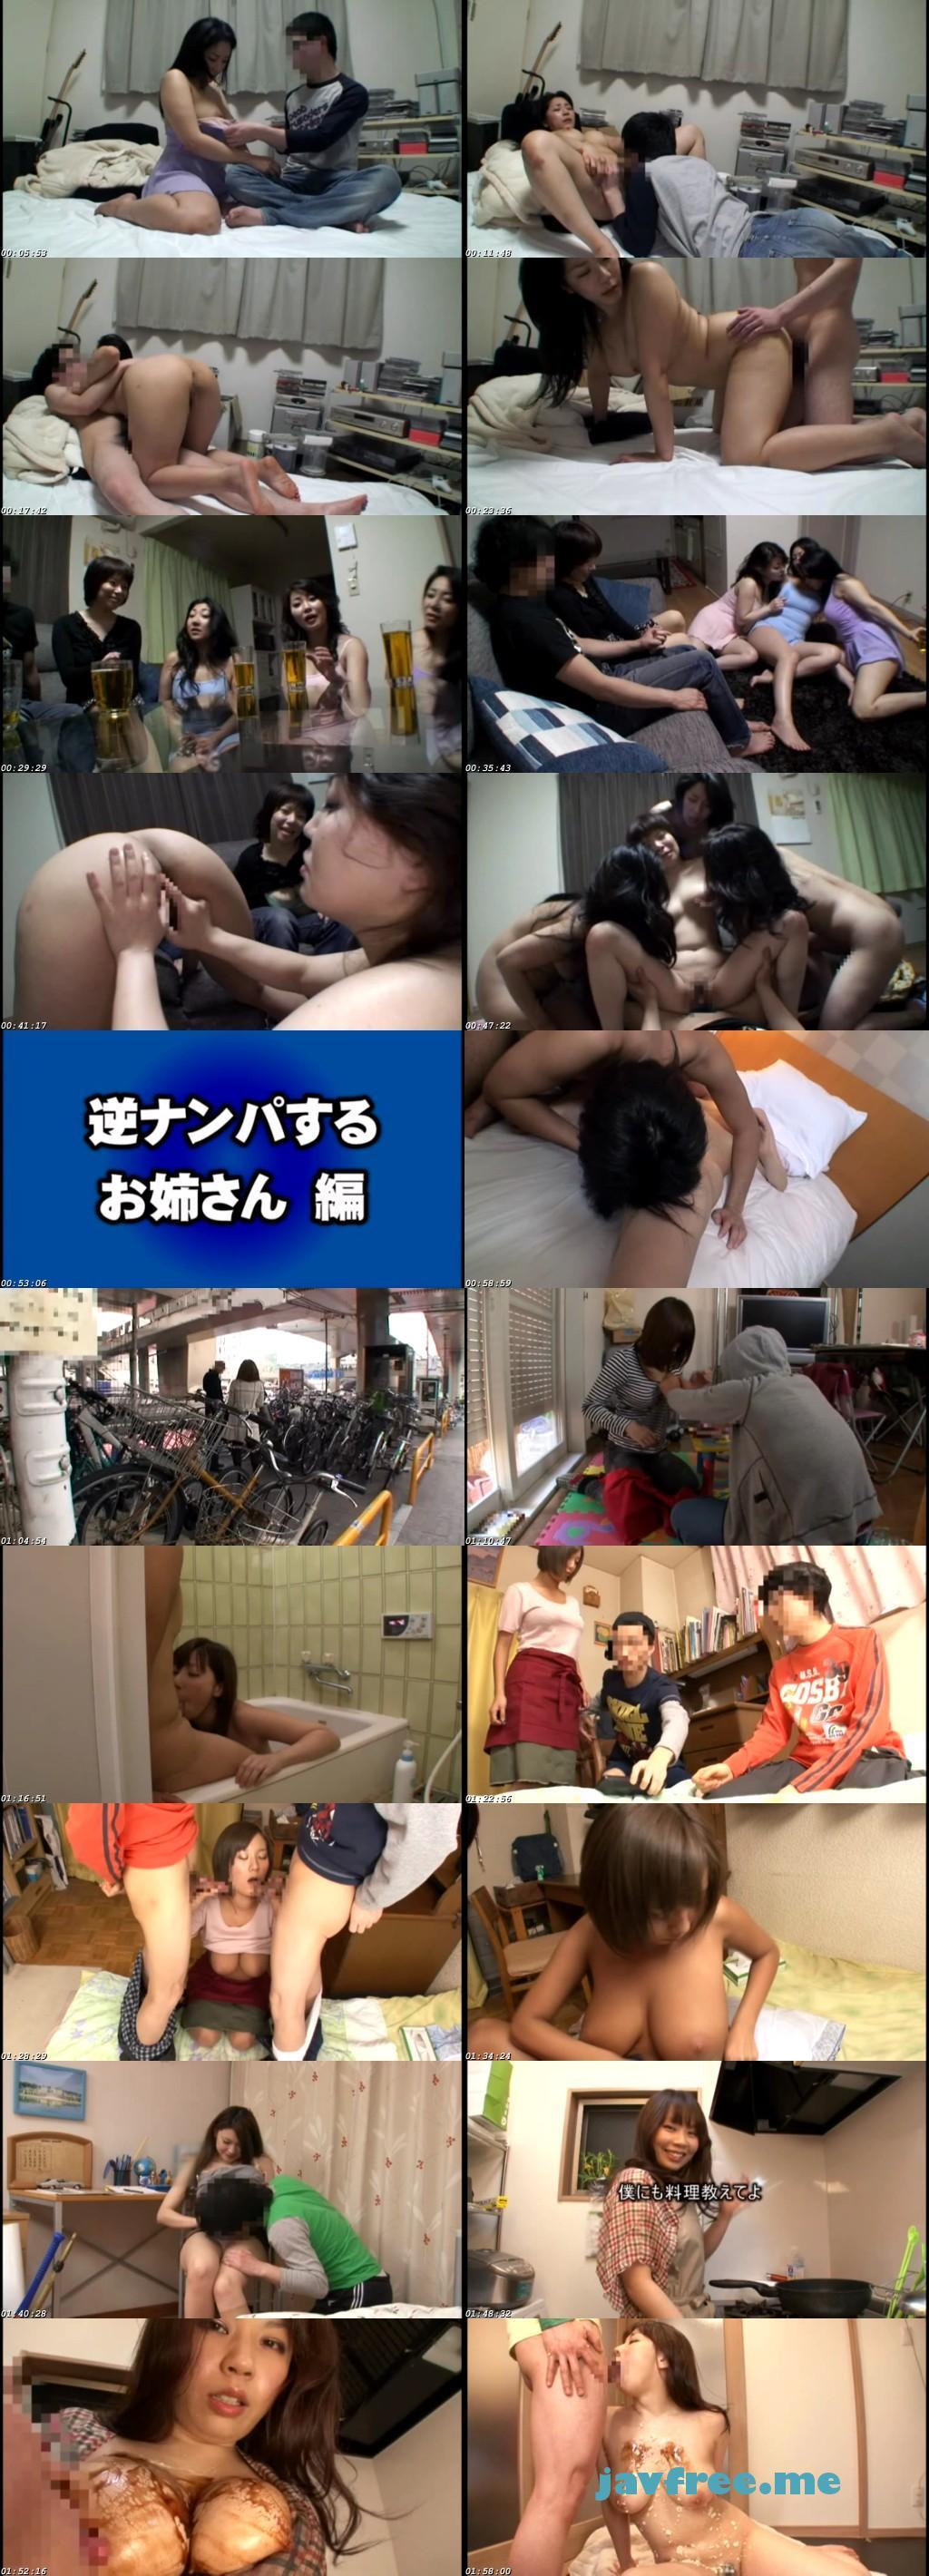 [SGSR 083] 草食系男子好き巨乳お姉さんがやさしく教えてあげる 4時間 SGSR